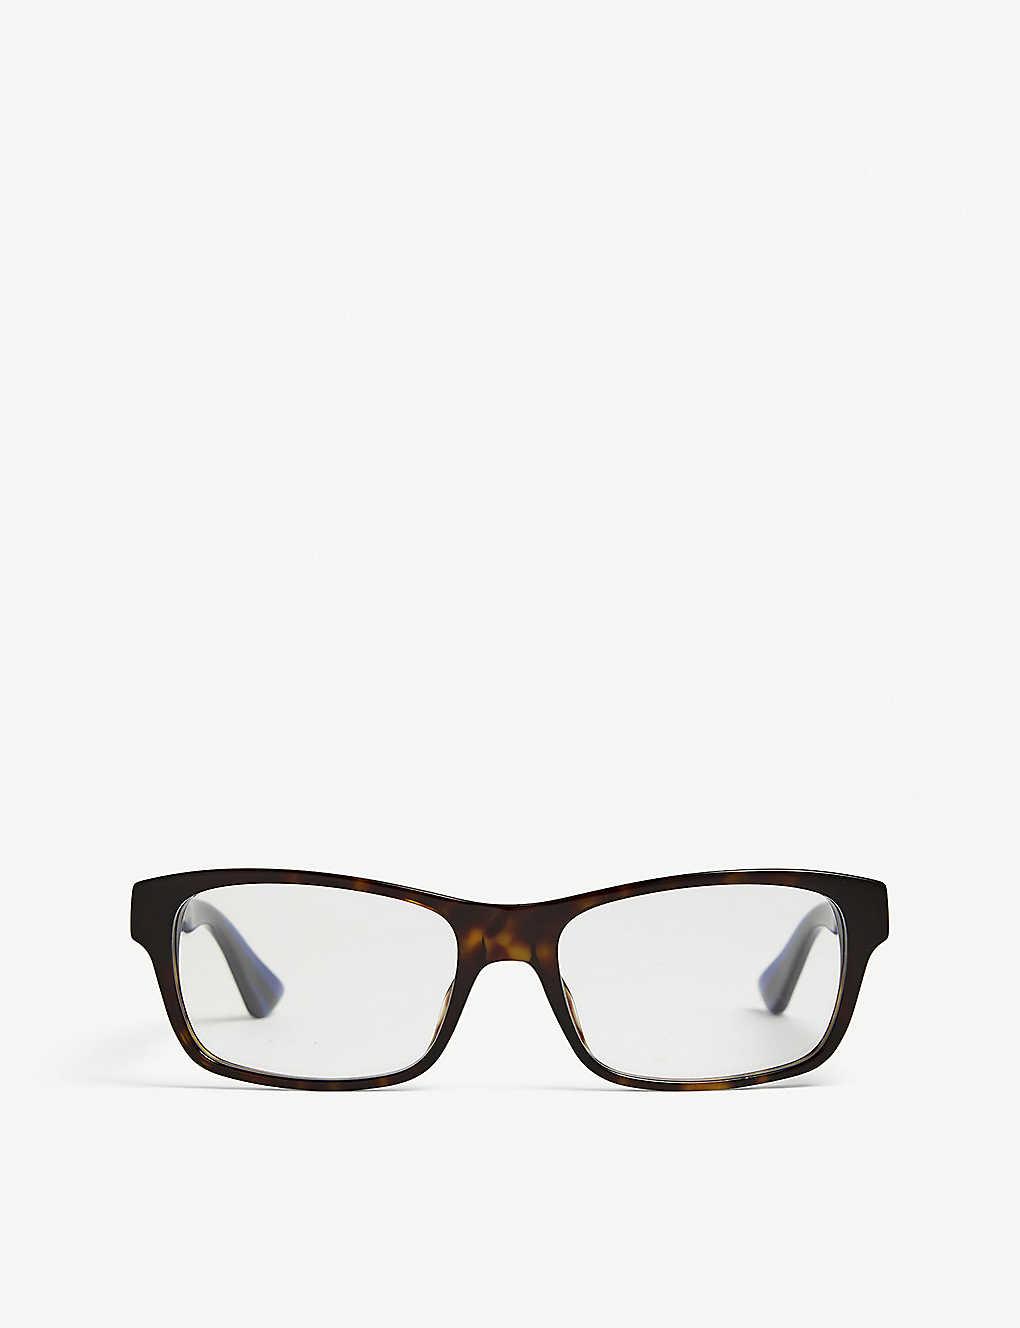 4b6dd75f301b GUCCI - GG0006O rectangle-frame Havana glasses | Selfridges.com